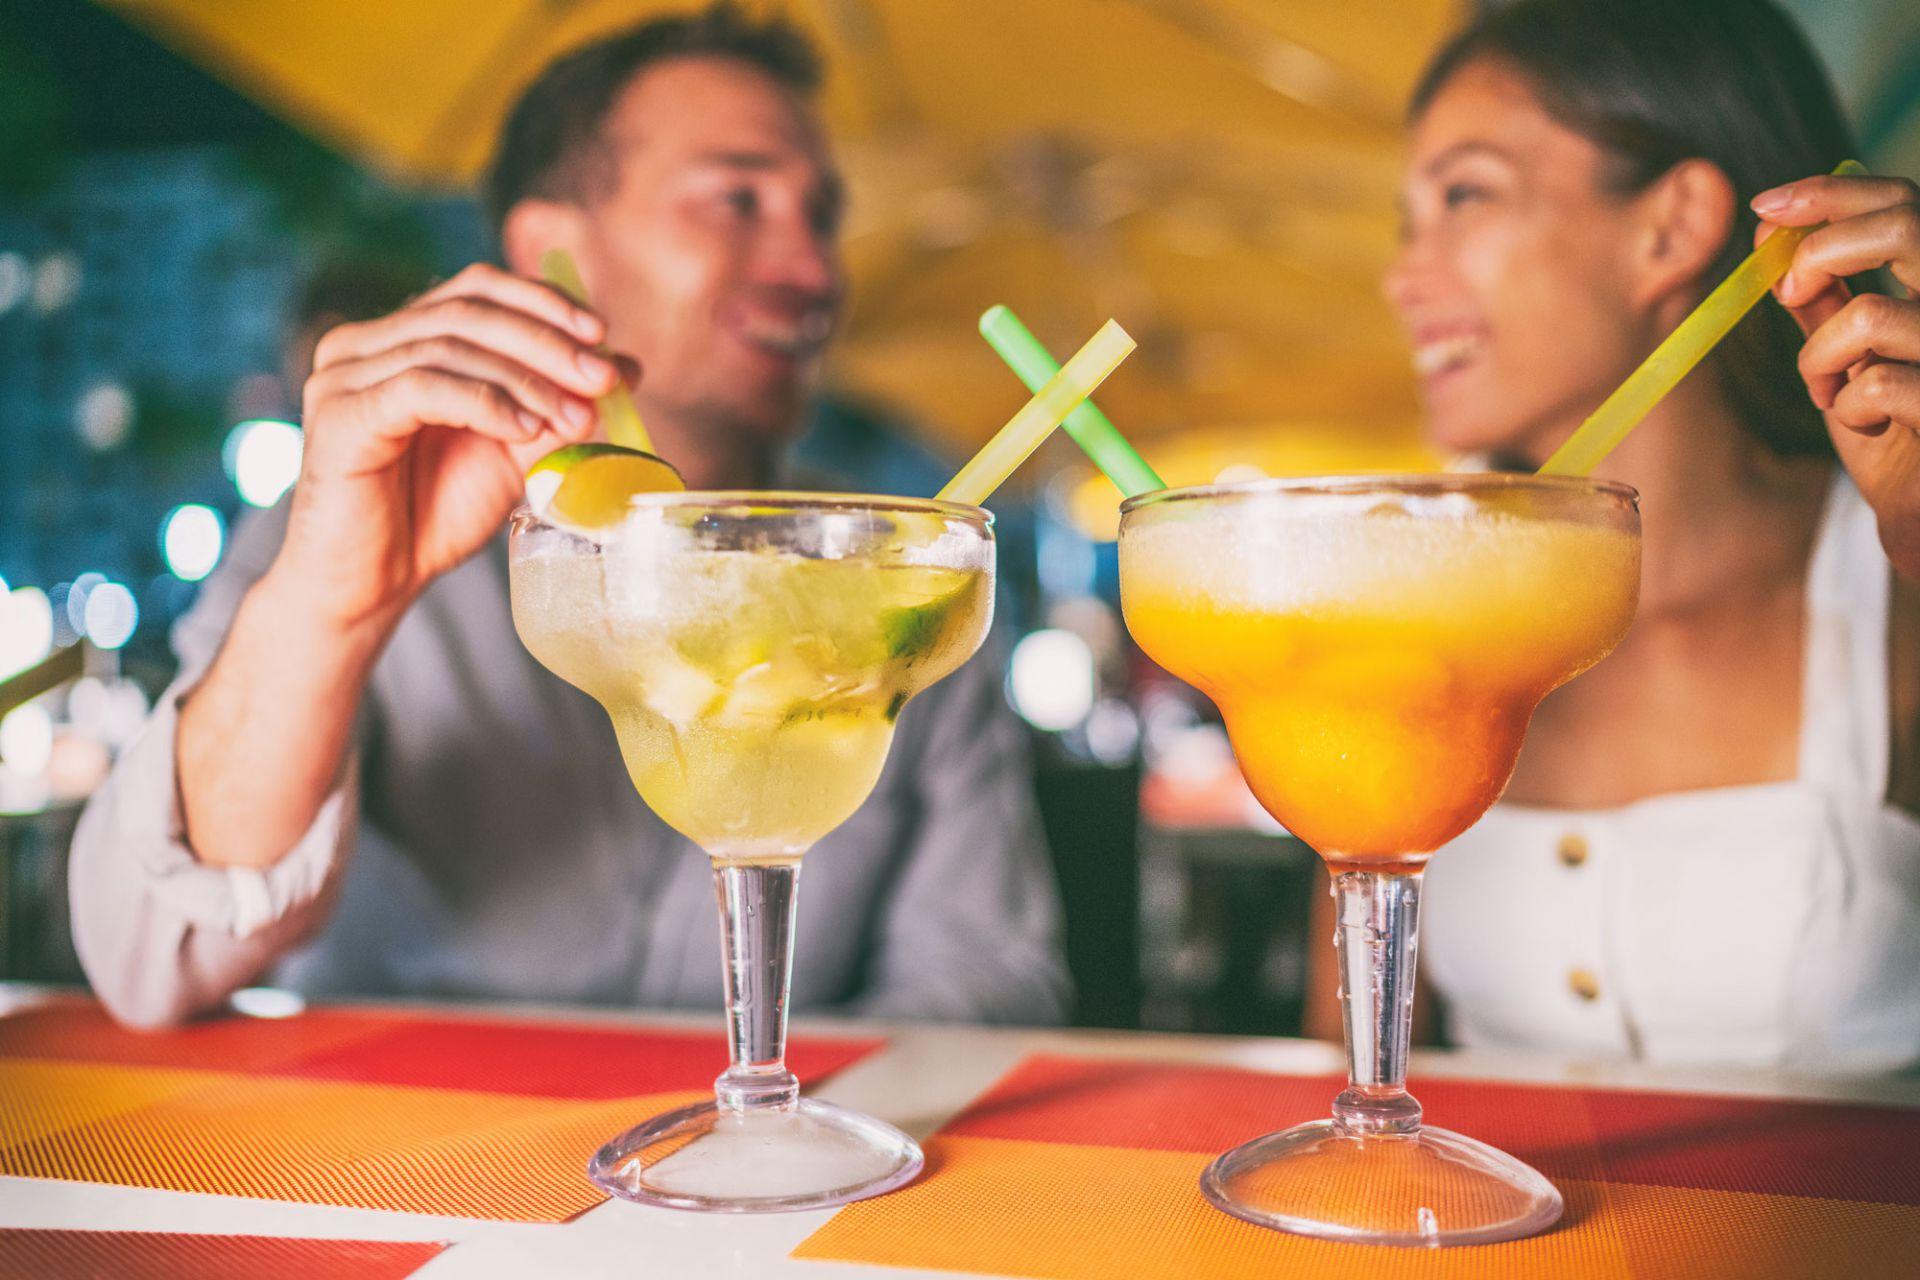 Two people sitting at a bar enjoying a glass of margarita